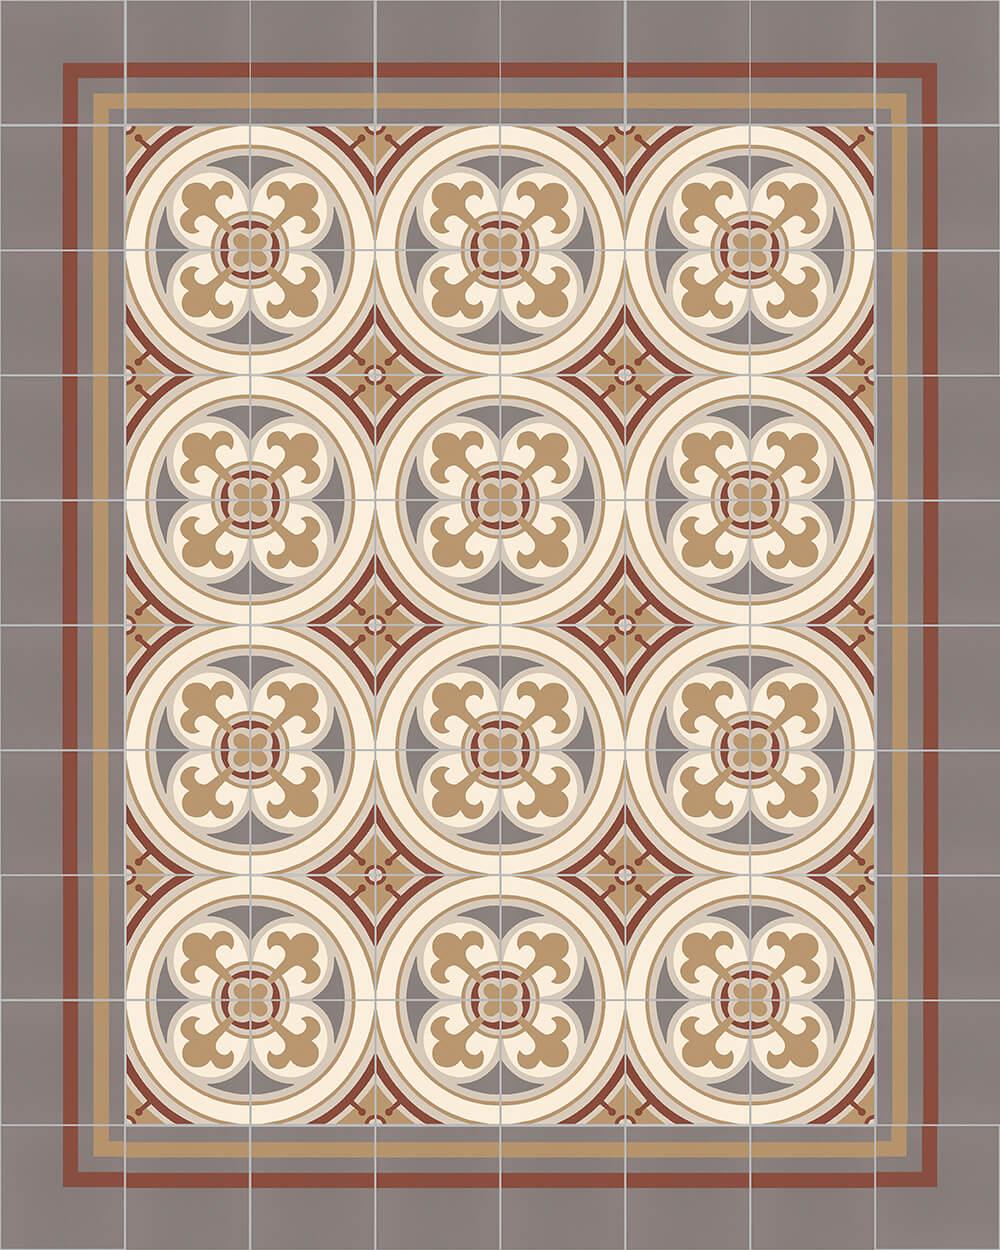 golem kunst und baukeramik gmbh ornamentfliese sf 550 d. Black Bedroom Furniture Sets. Home Design Ideas